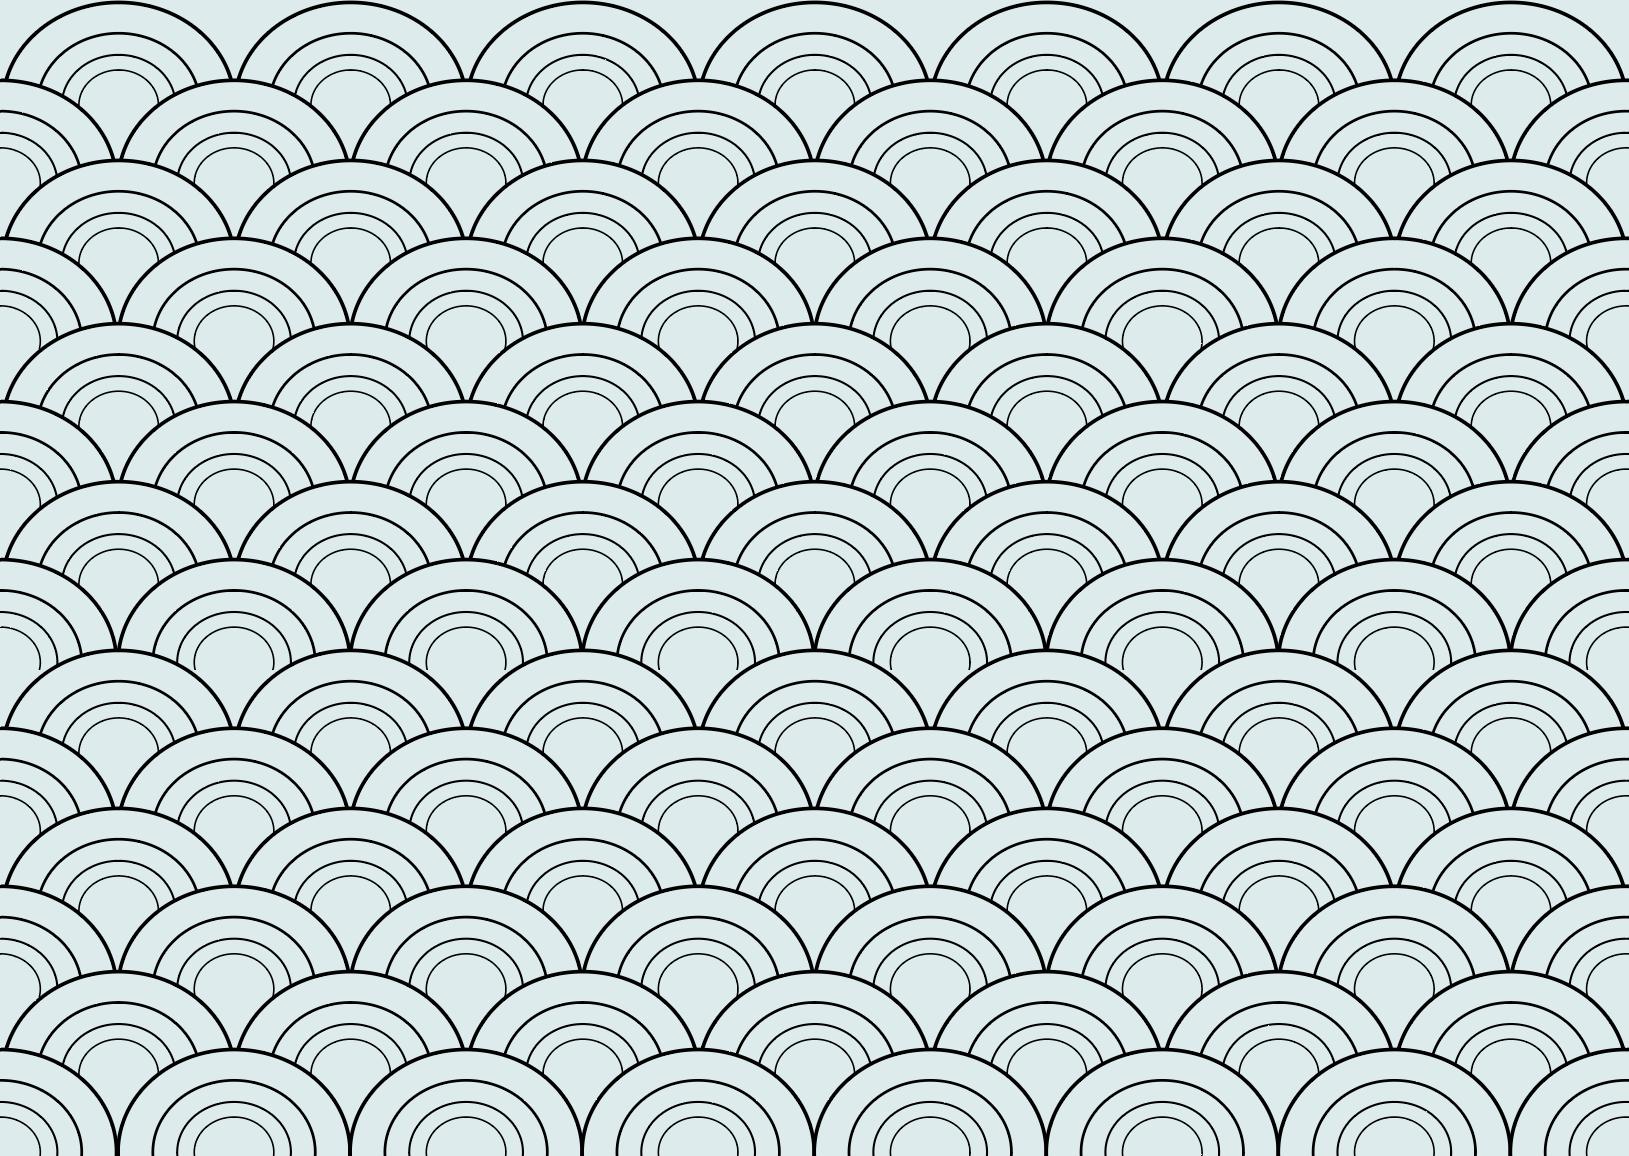 Illustrator_2020-05-05_14-52-47